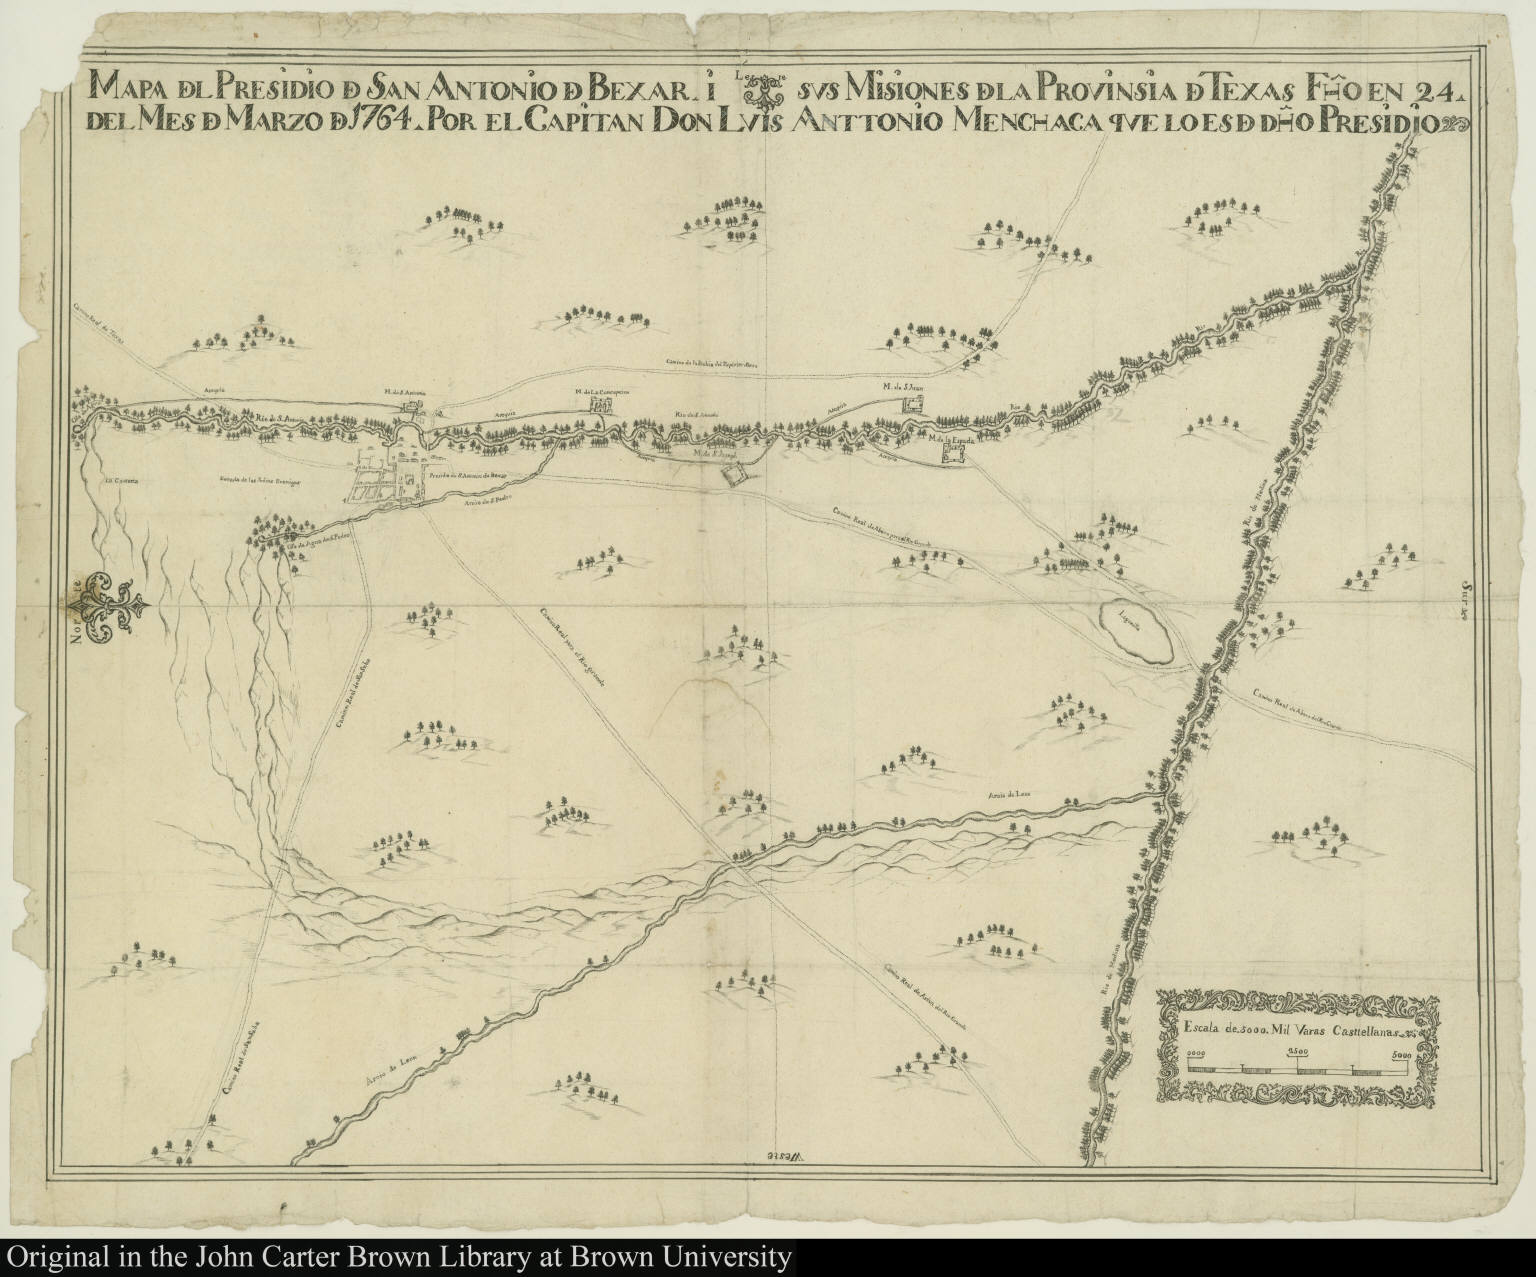 Mapa D E L Presidio D E San Antonio D E Bexar I Sus